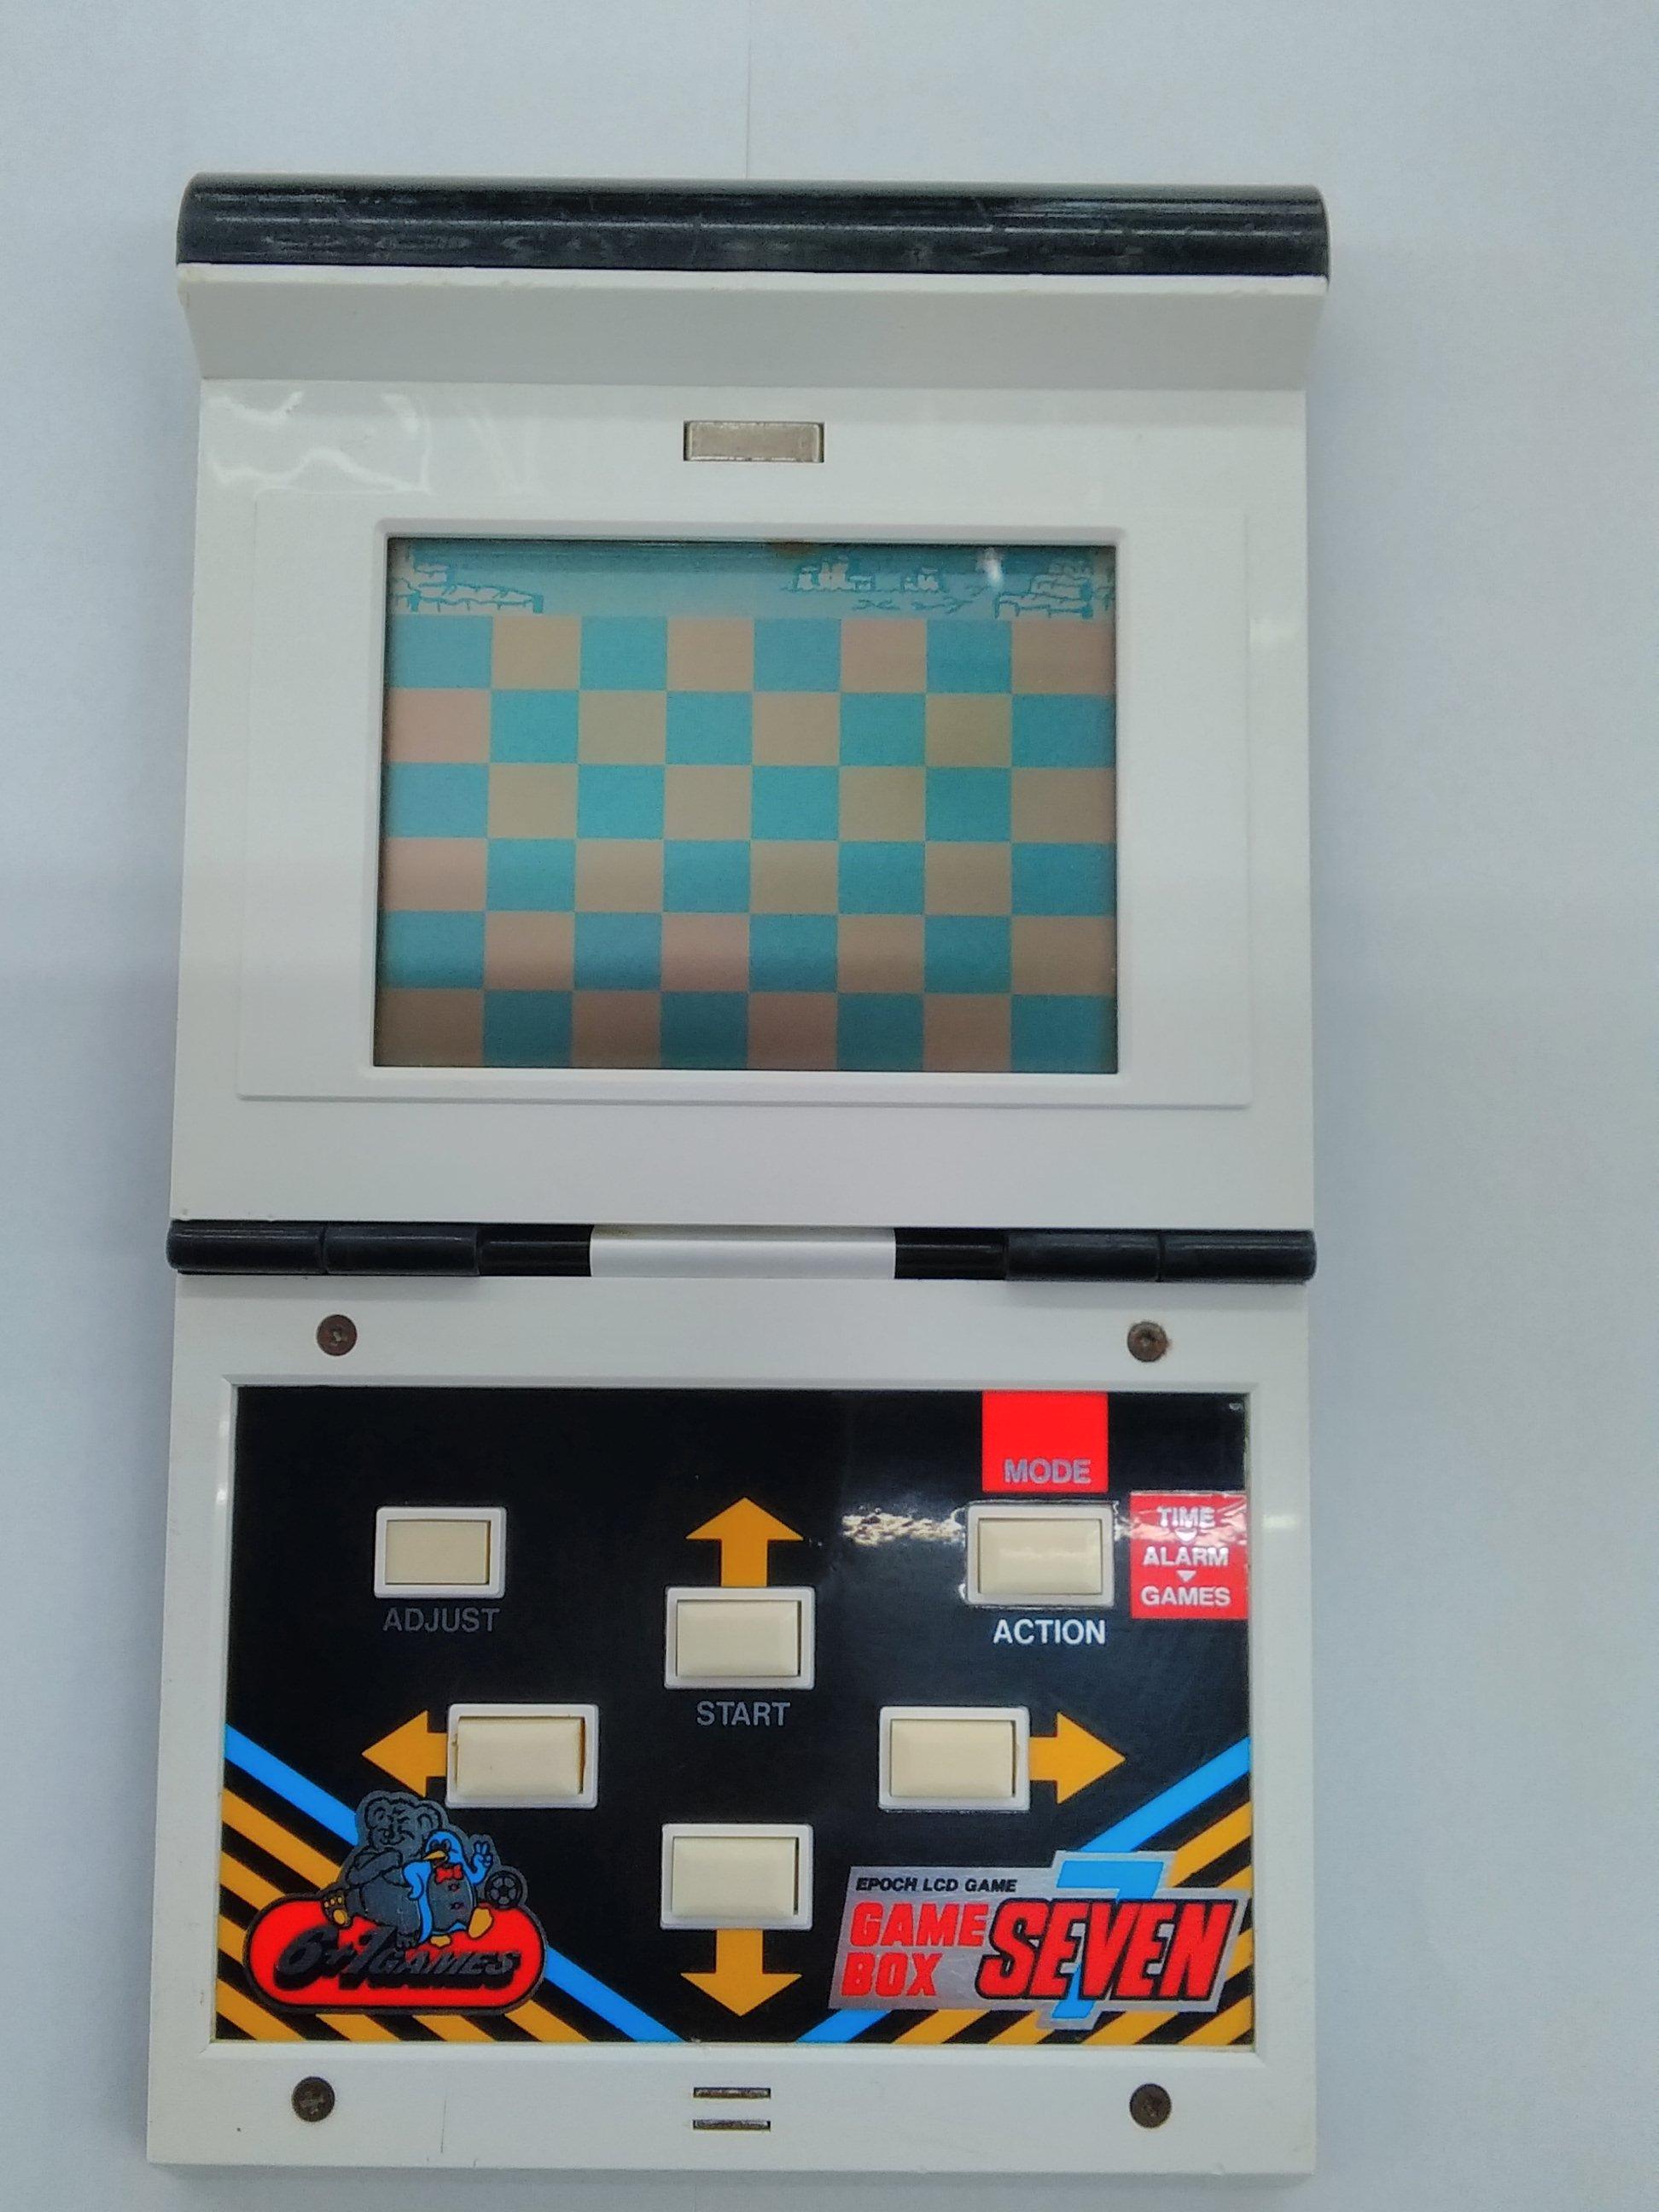 GAME BOX SEVEN|EPOCH